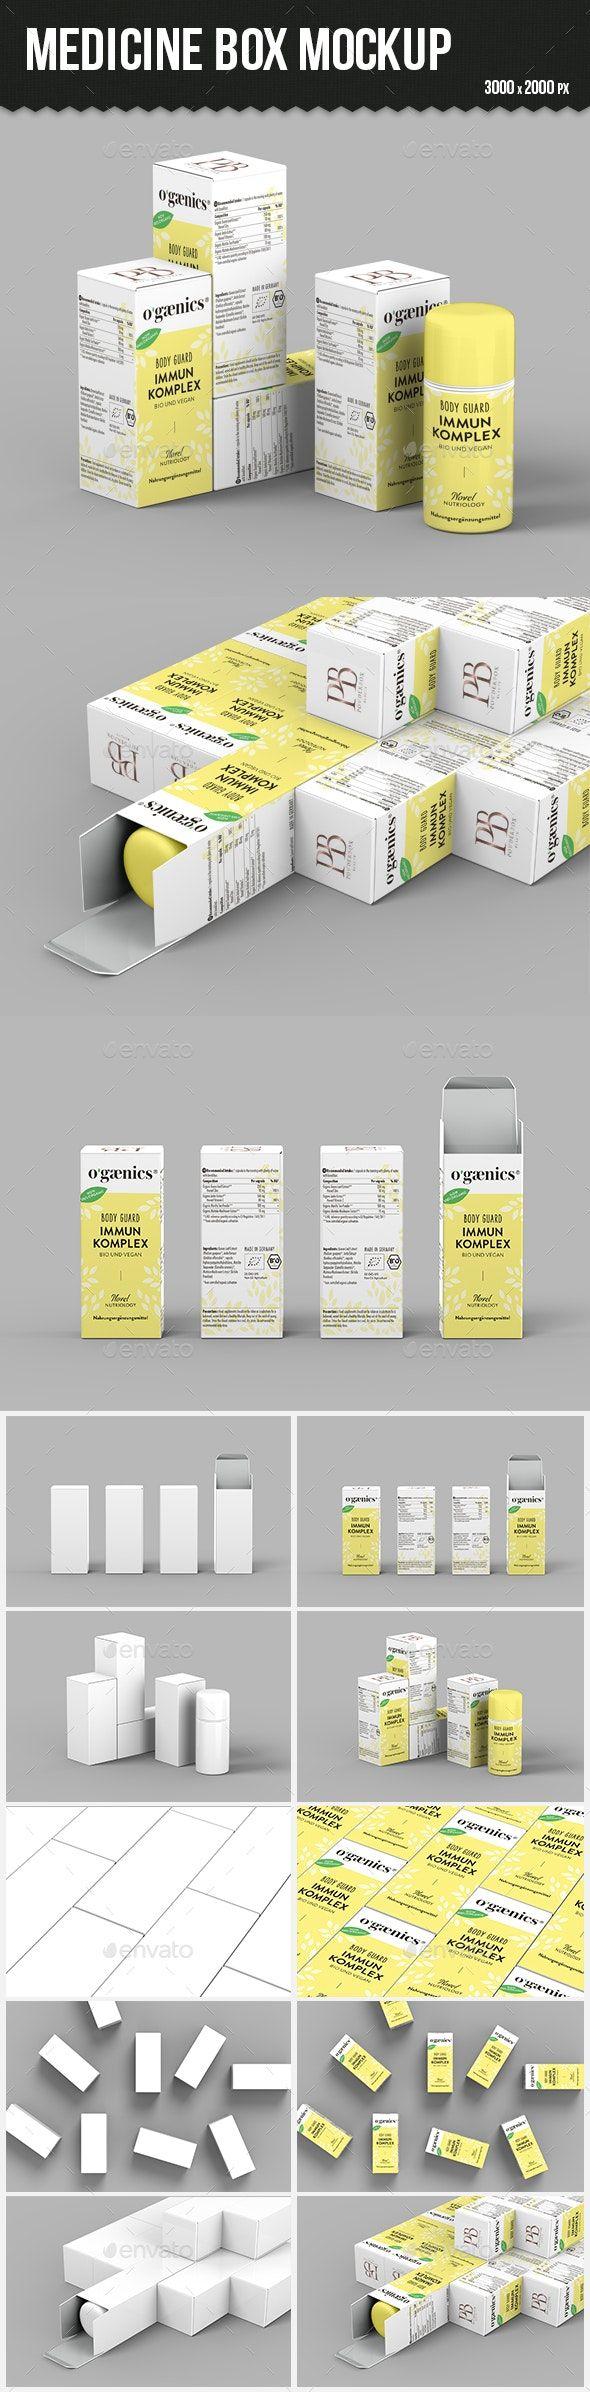 Download Medicine Box Mockup Box Mockup Medicine Boxes Mockup